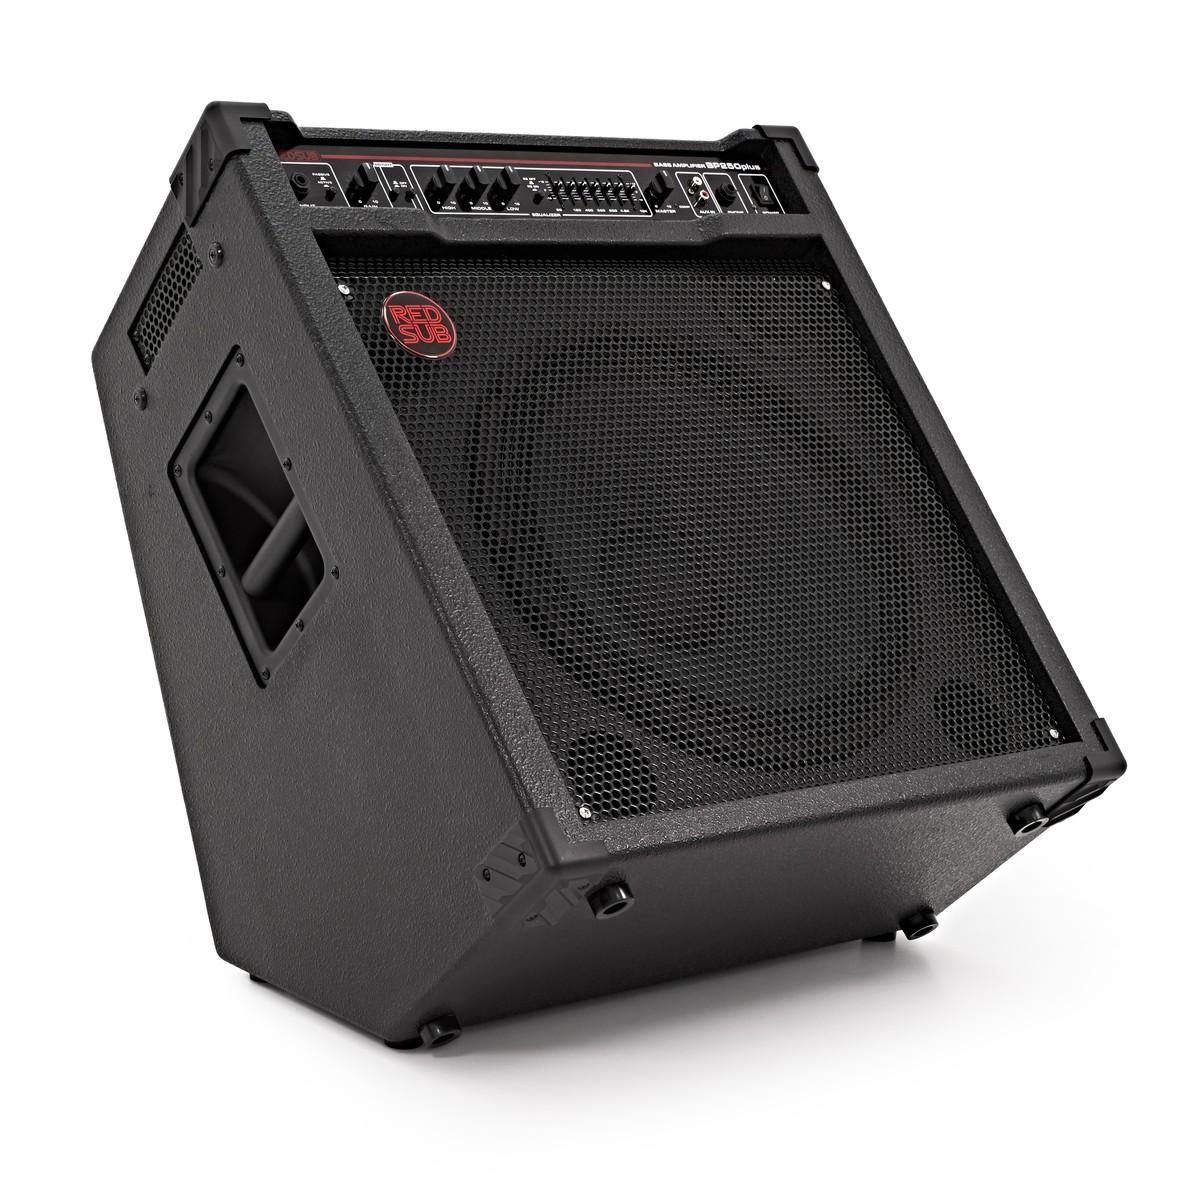 redsub bp250plus 250w bass guitar amplifier box opened at. Black Bedroom Furniture Sets. Home Design Ideas